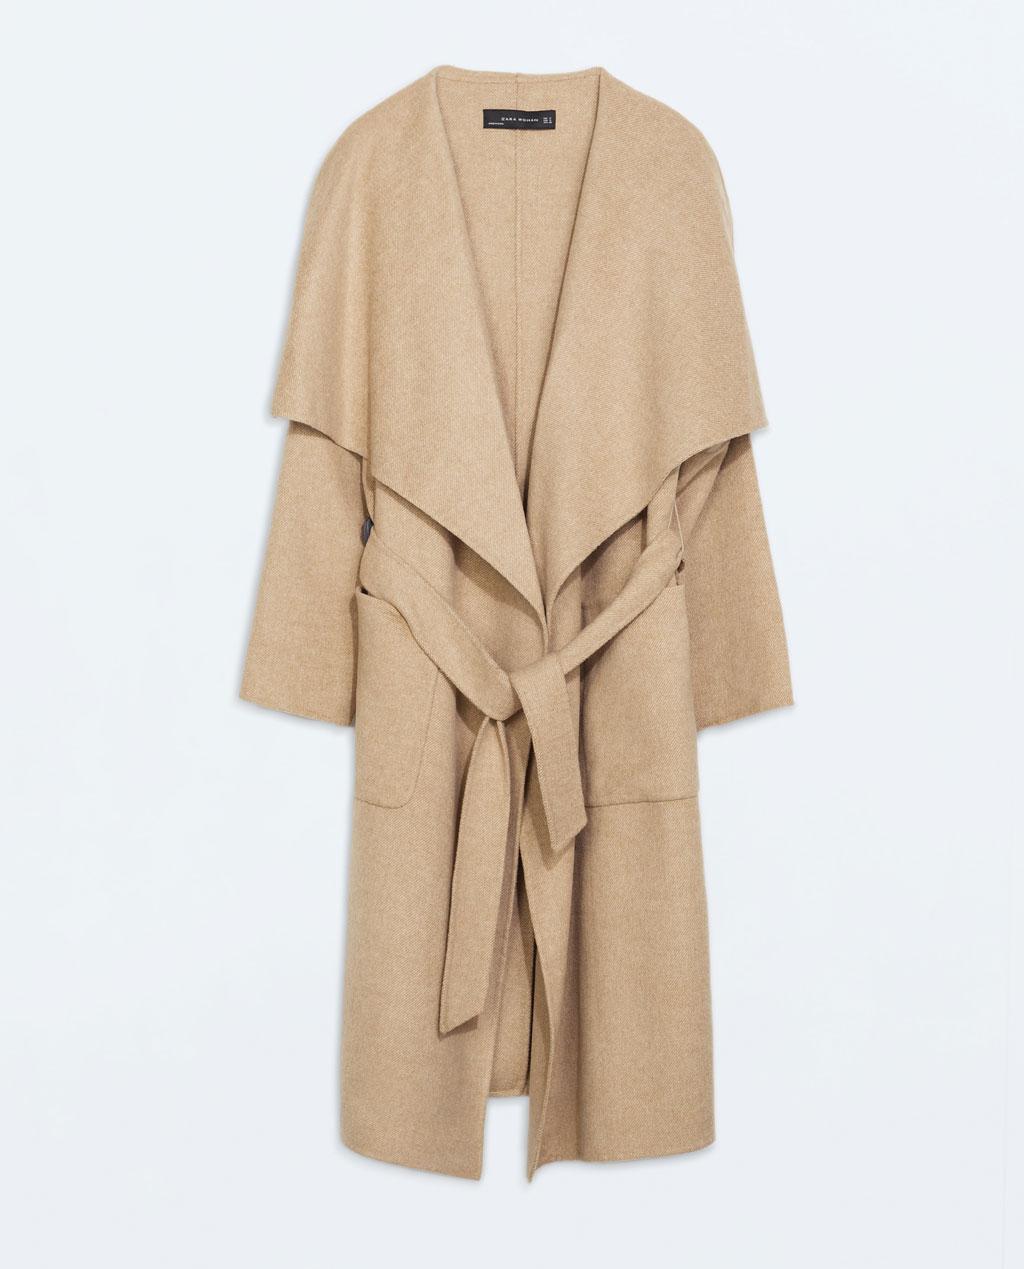 Herbst Mantel